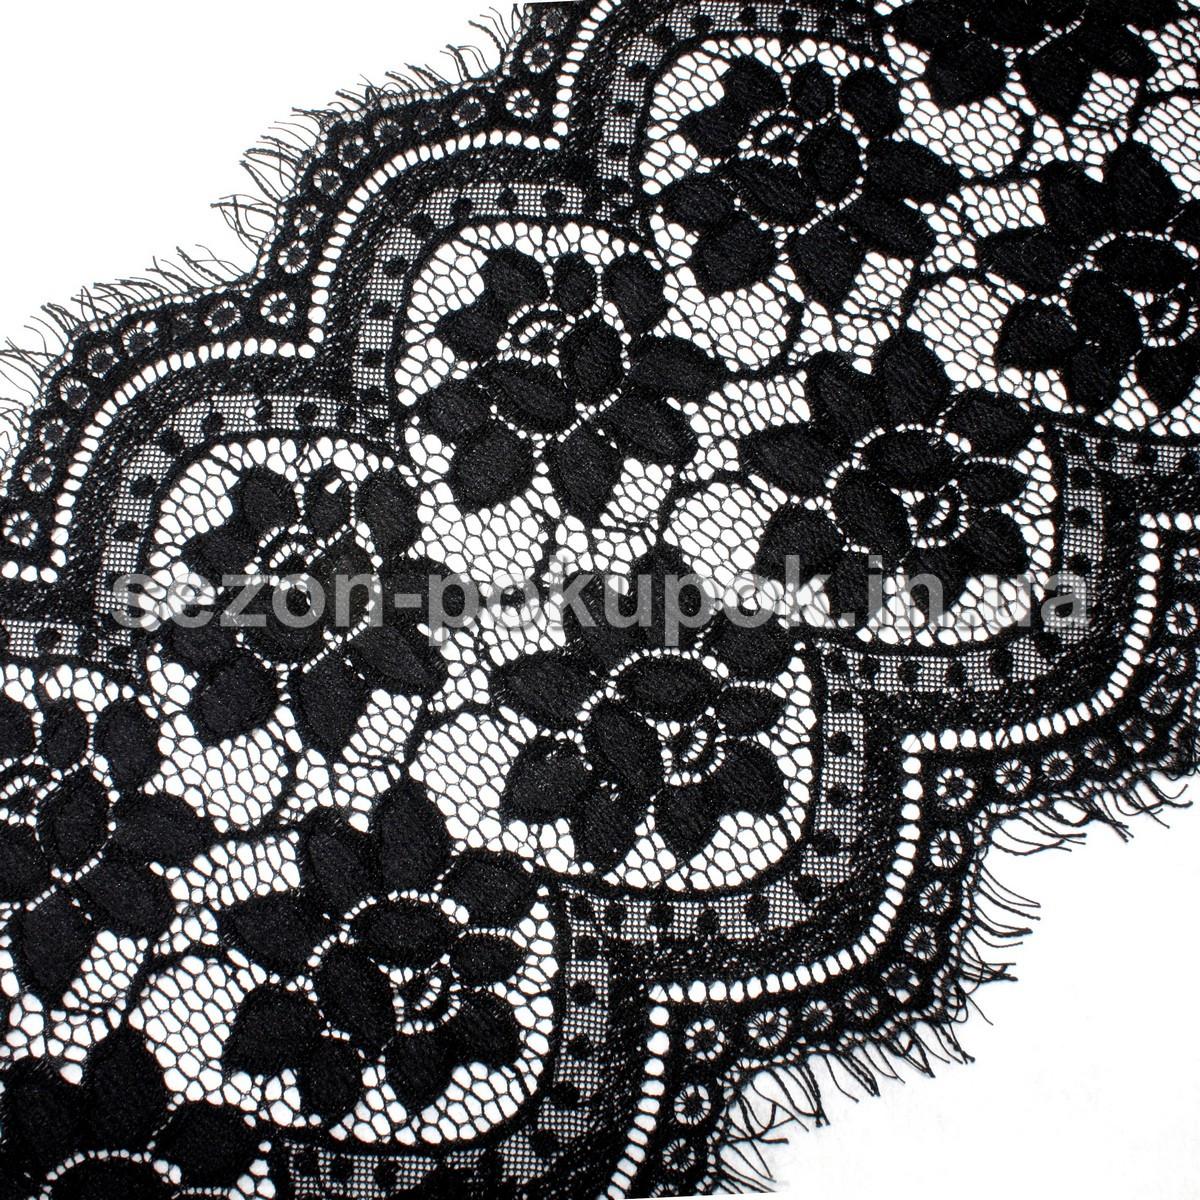 Французское кружево (Шантильи, с ресничками) ширина 23,5см (цена за 3 м). Цвет - черный